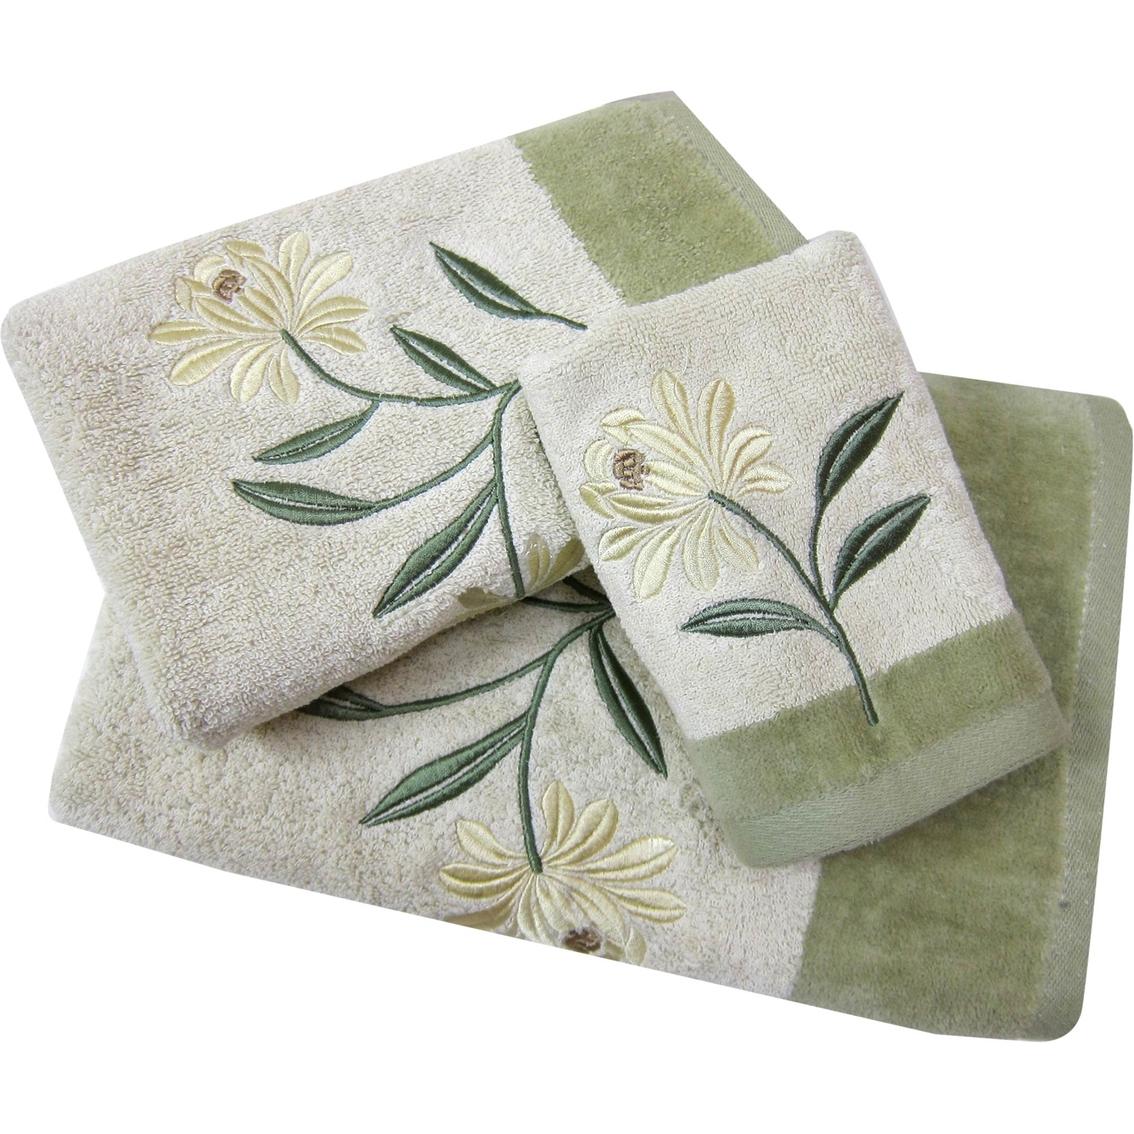 Croscill Penelope Hand Towel | Bath Towels | Home & Appliances ...